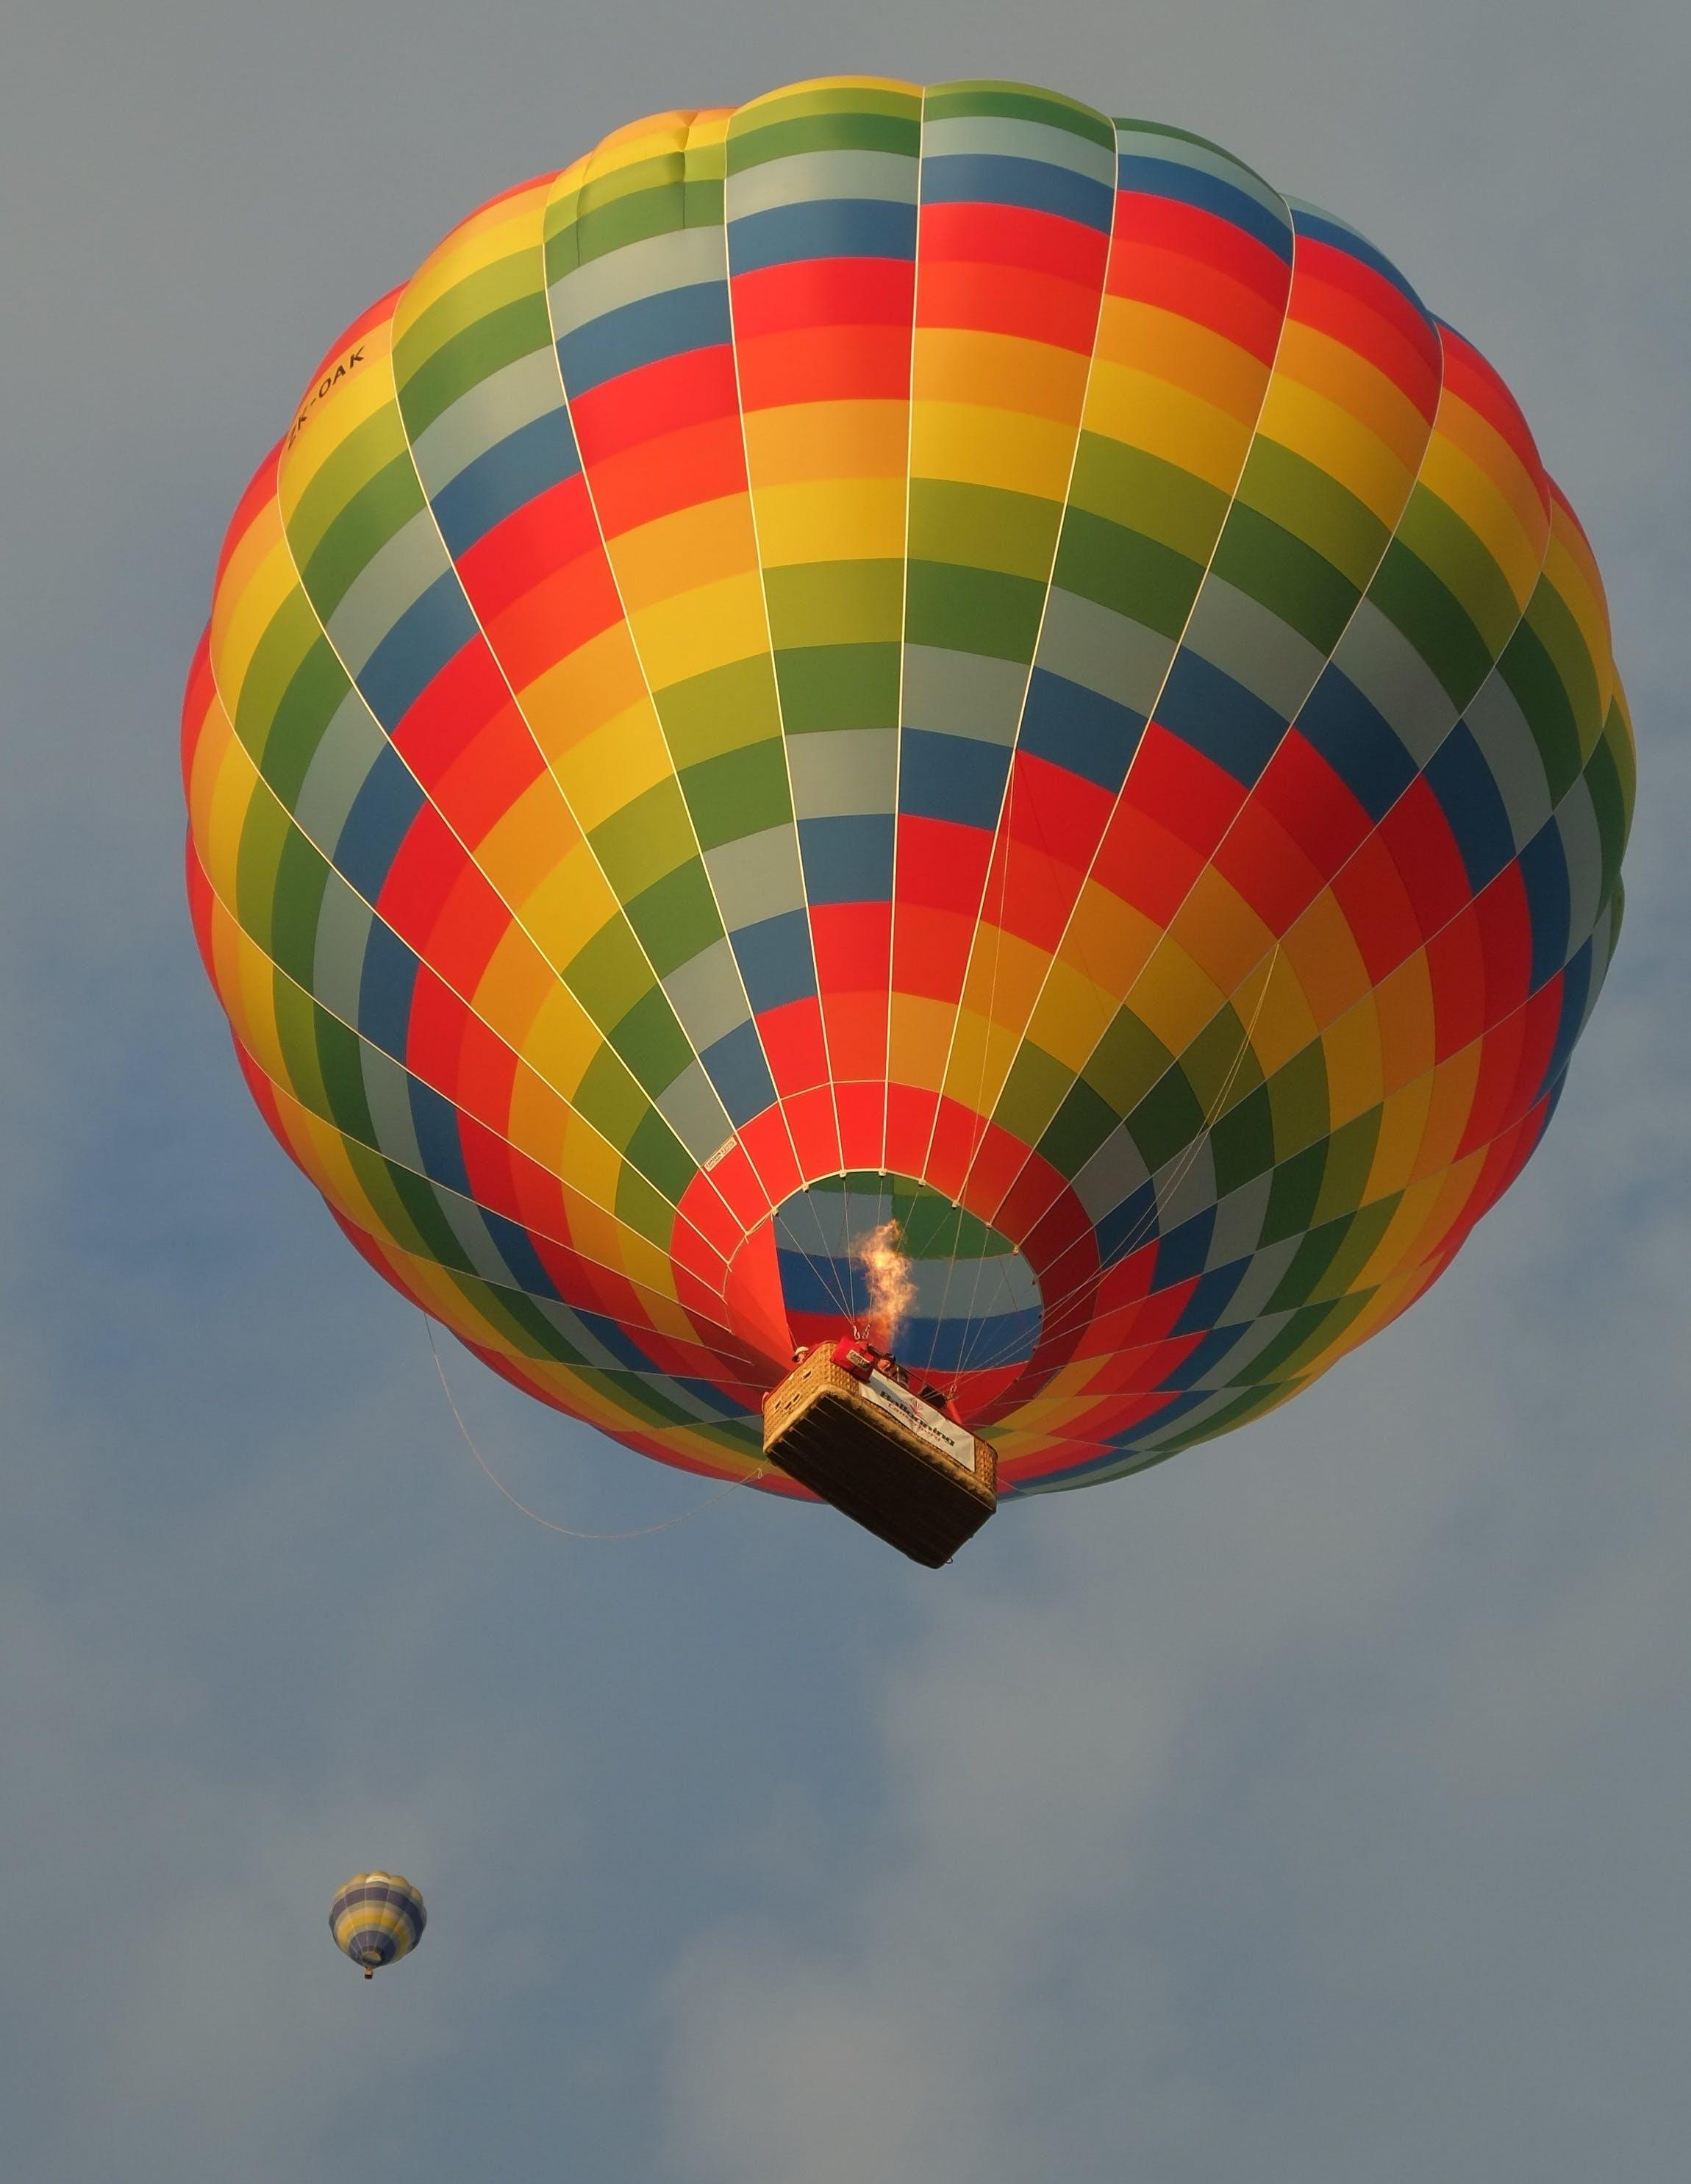 Kostenloses Stock Foto zu ballons, bunt, heißluftballons, himmel